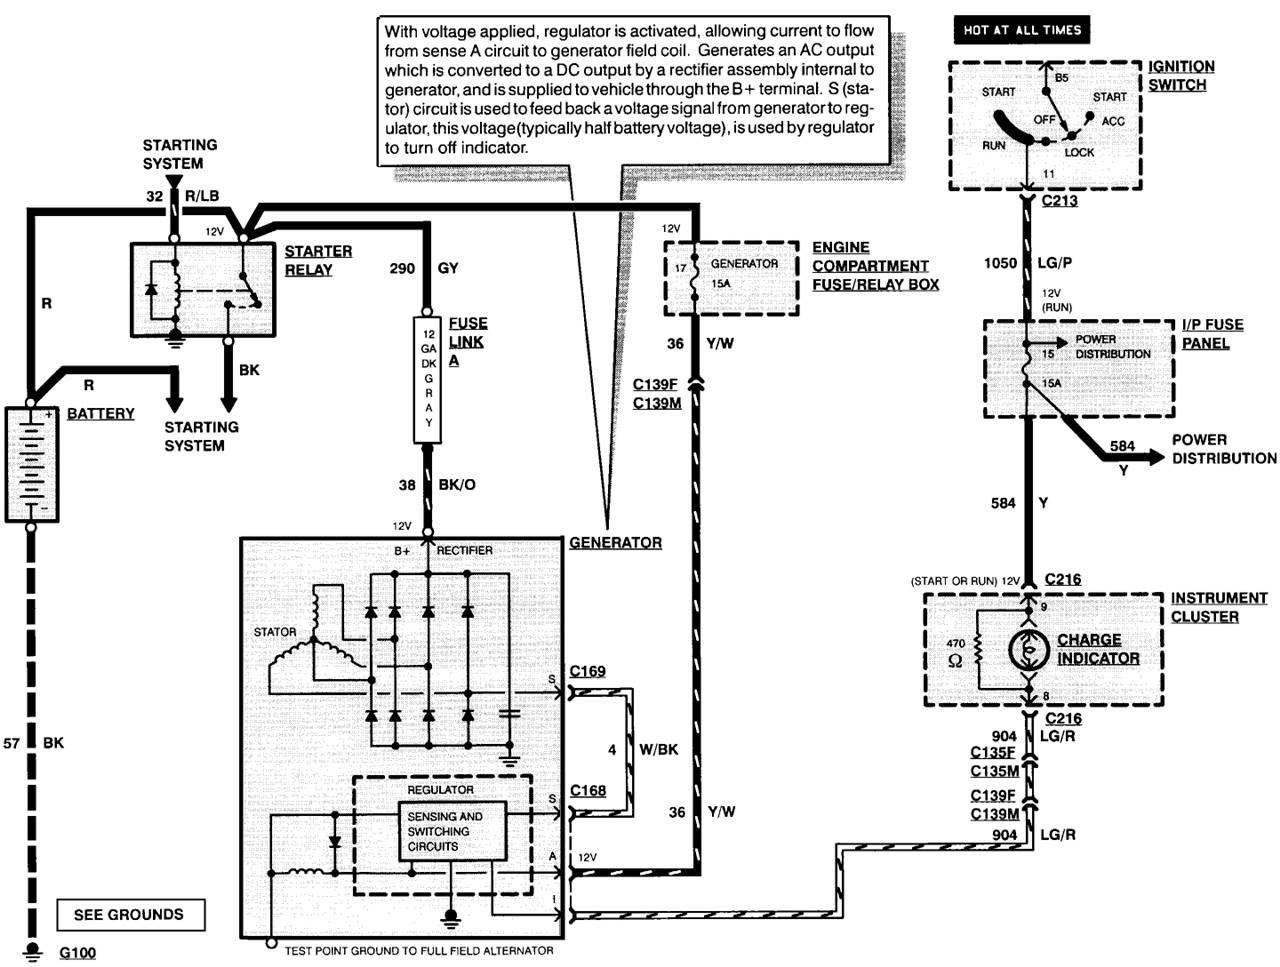 94 Ford Ranger Alternator Wiring Diagram | Wiring Diagram - Alternator Wiring Diagram